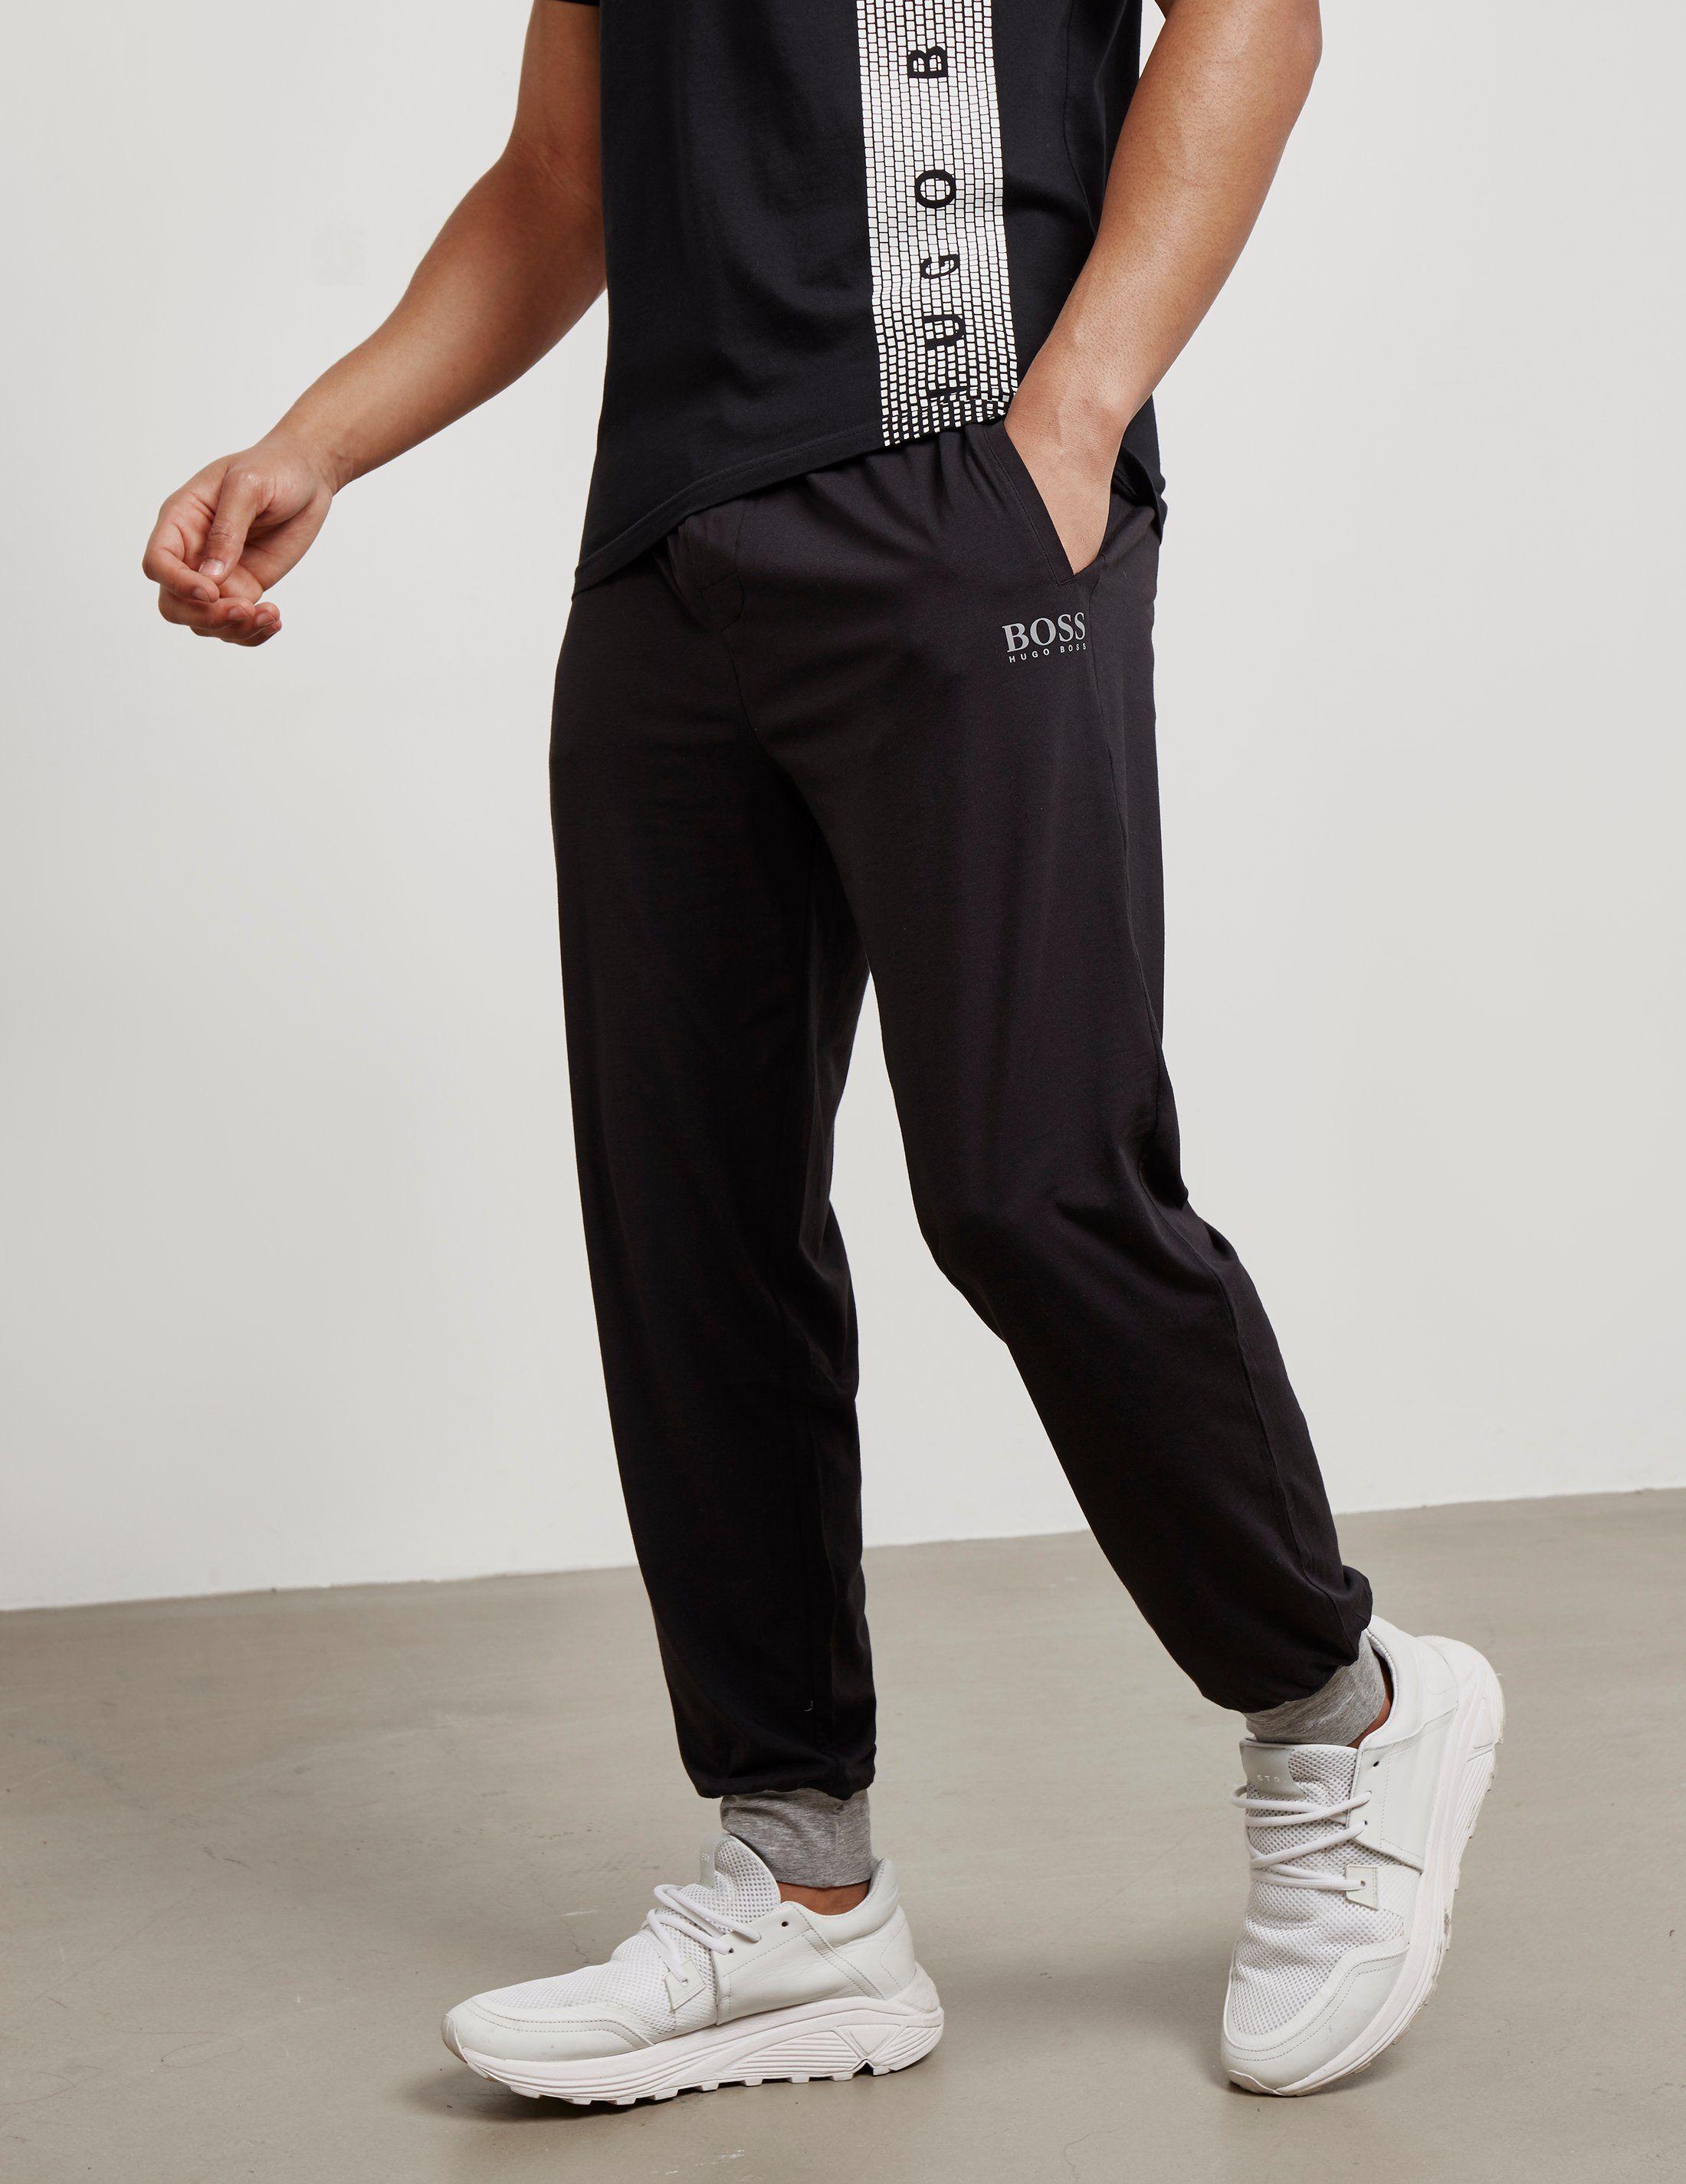 BOSS Night Cuffed Fleece Lounge Pants